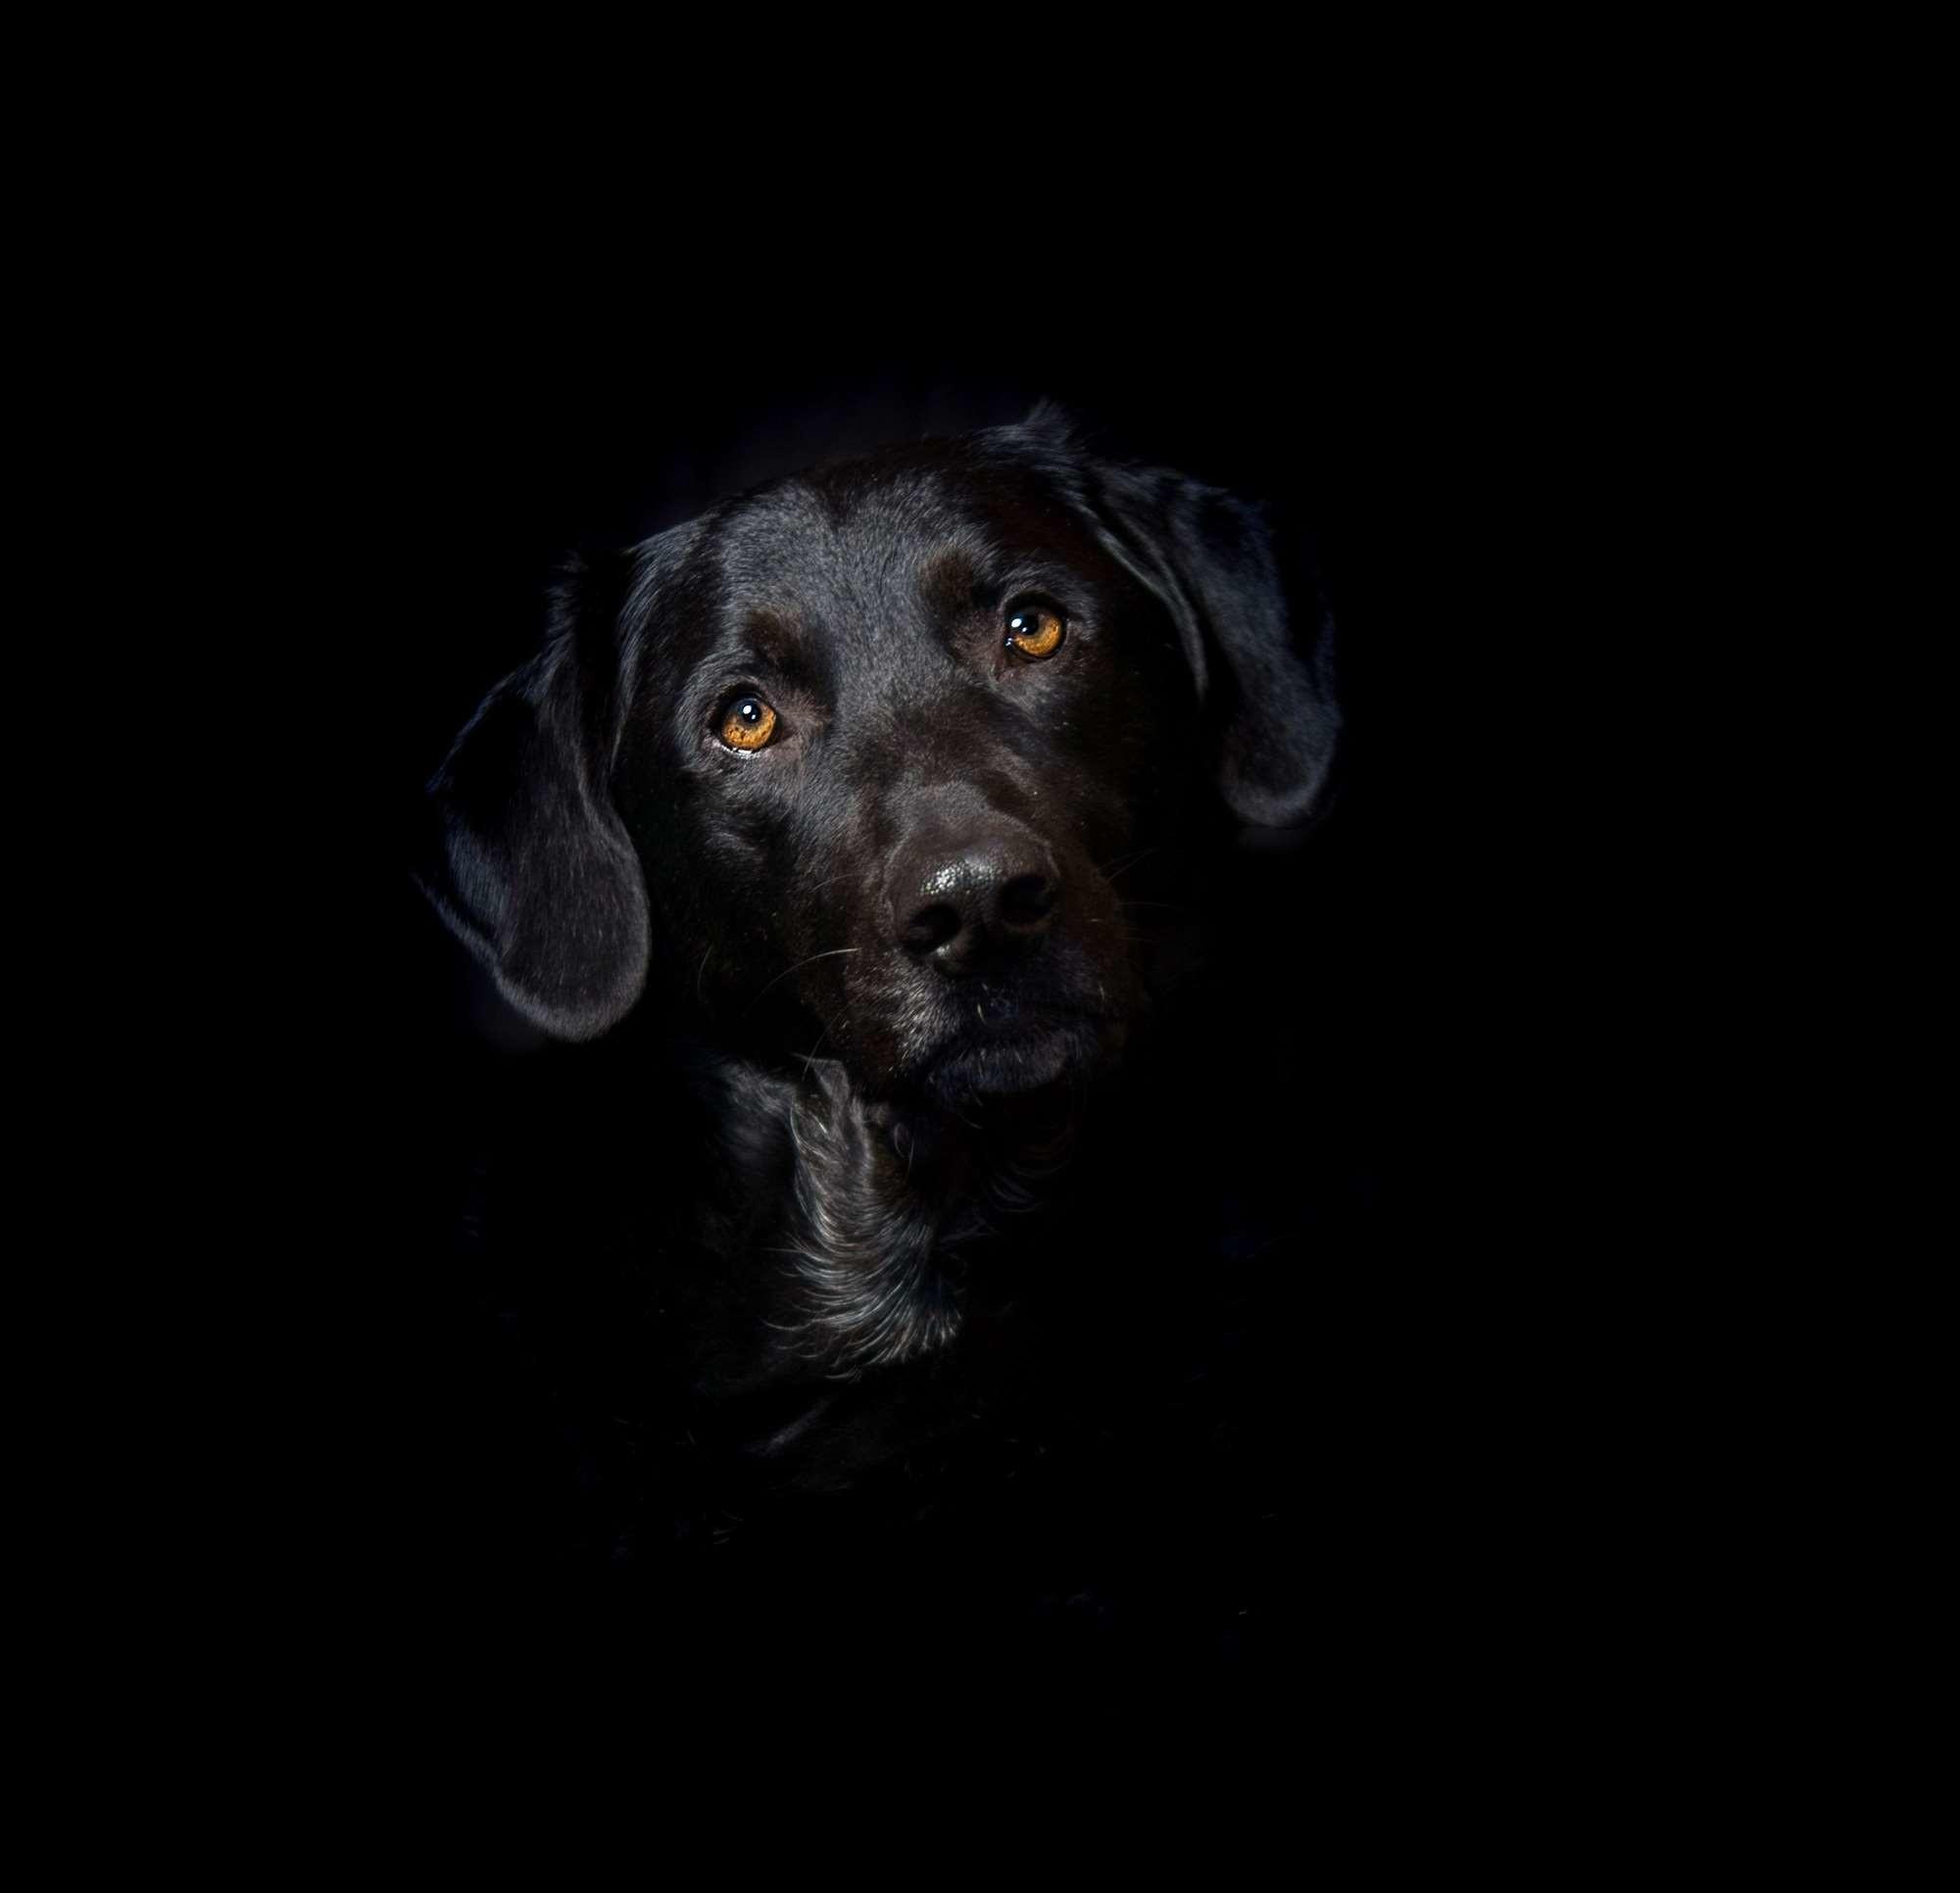 Res: 2000x1932, ... ears, eyes, fur, good, greedy, head, hybrid, labrador, labrador  mongrel, love, mix, nose, pet, portait, pride, protector, snout wallpaper  and background